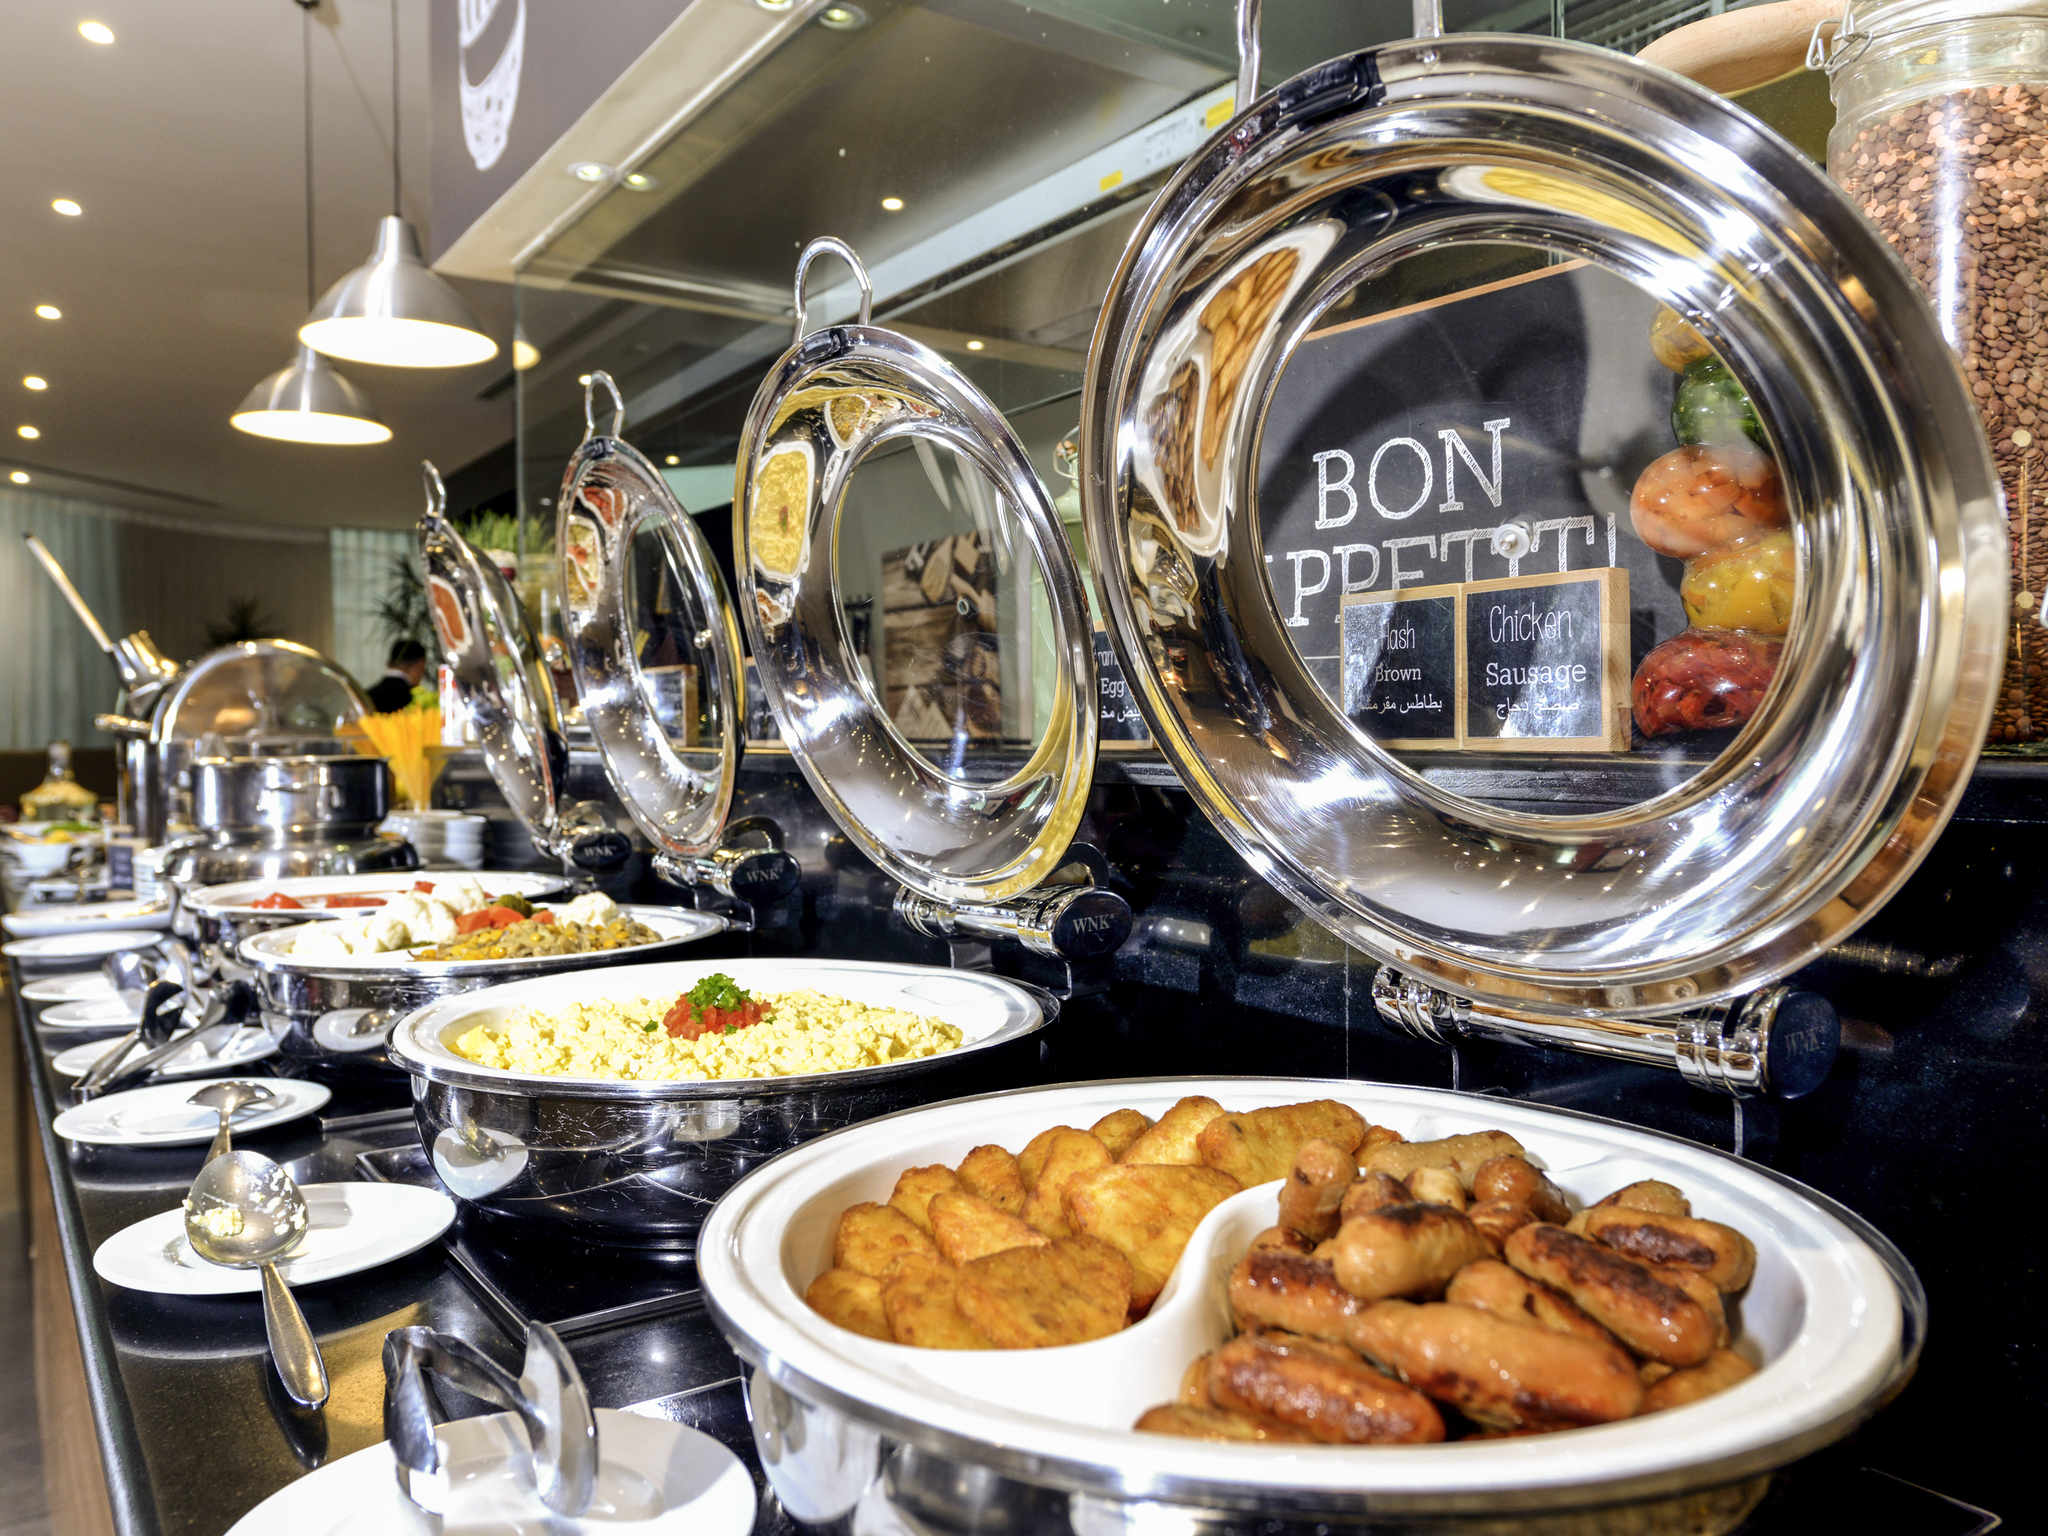 Hotel In Manama Ibis Seef With Gym Pool The Little Things She Needs Kashira 2b Brown Cokelat 38 Breakfast